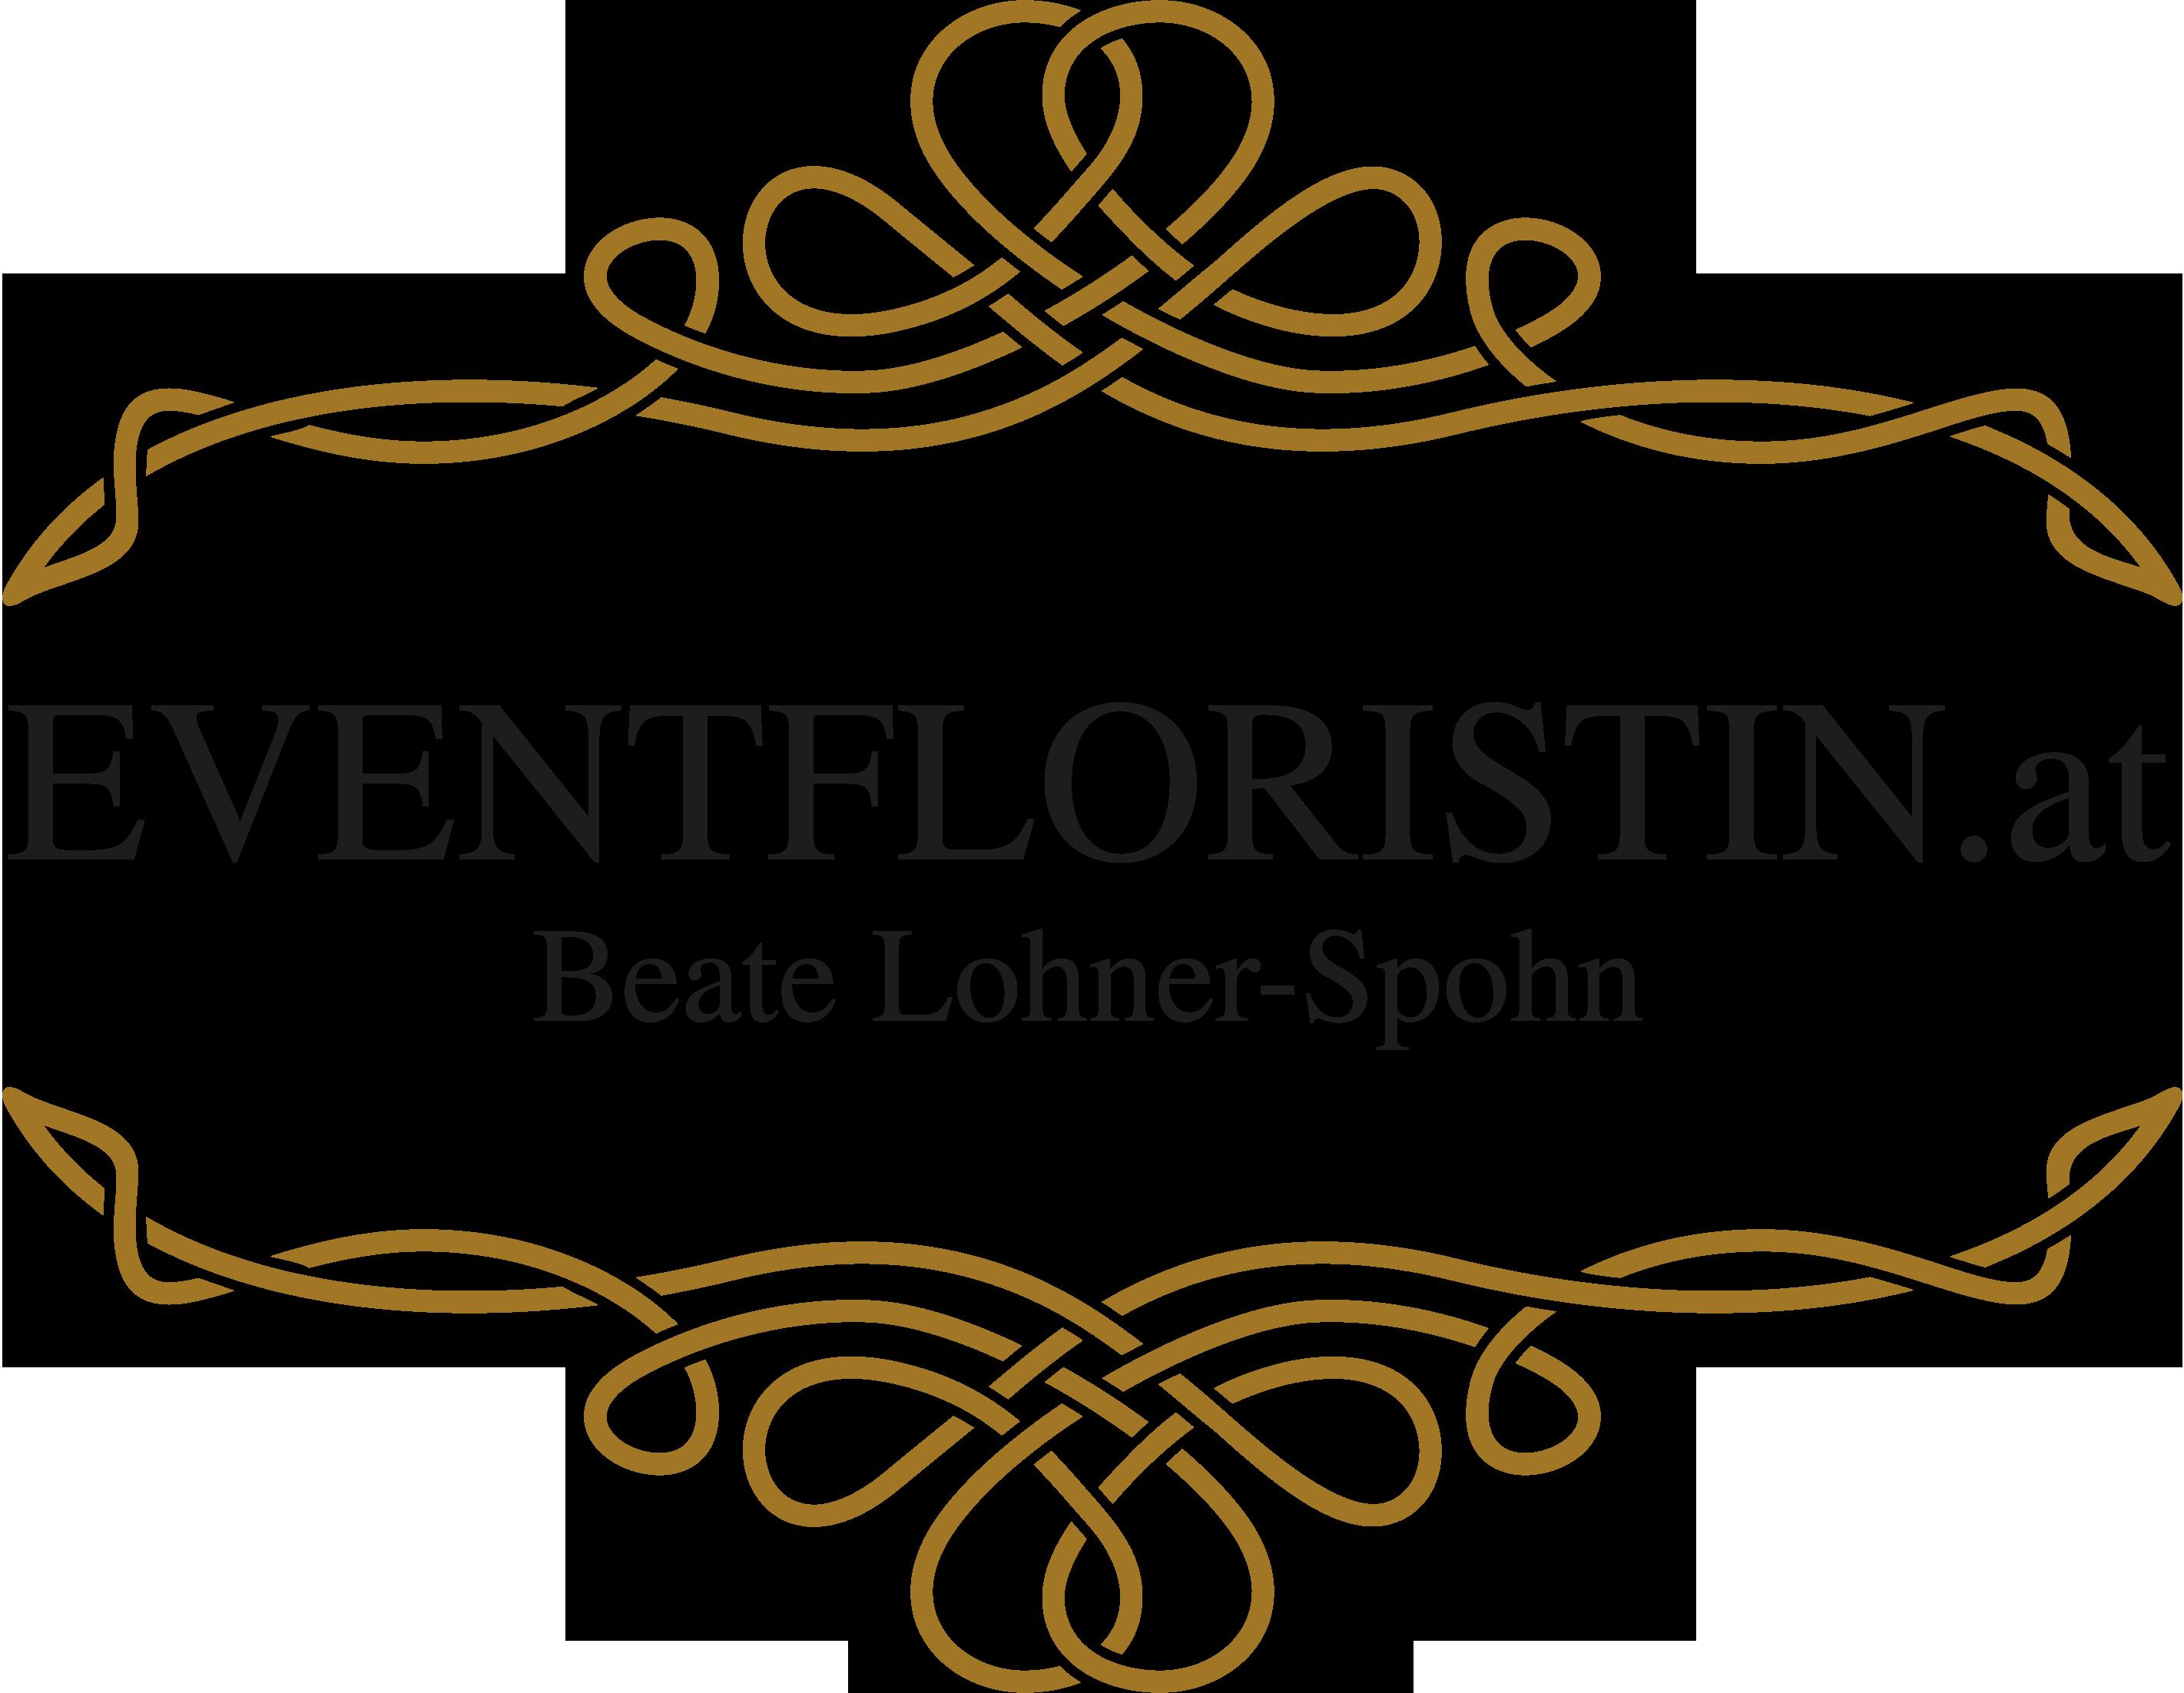 logo_eventfloristin_beate_lohner-spohn